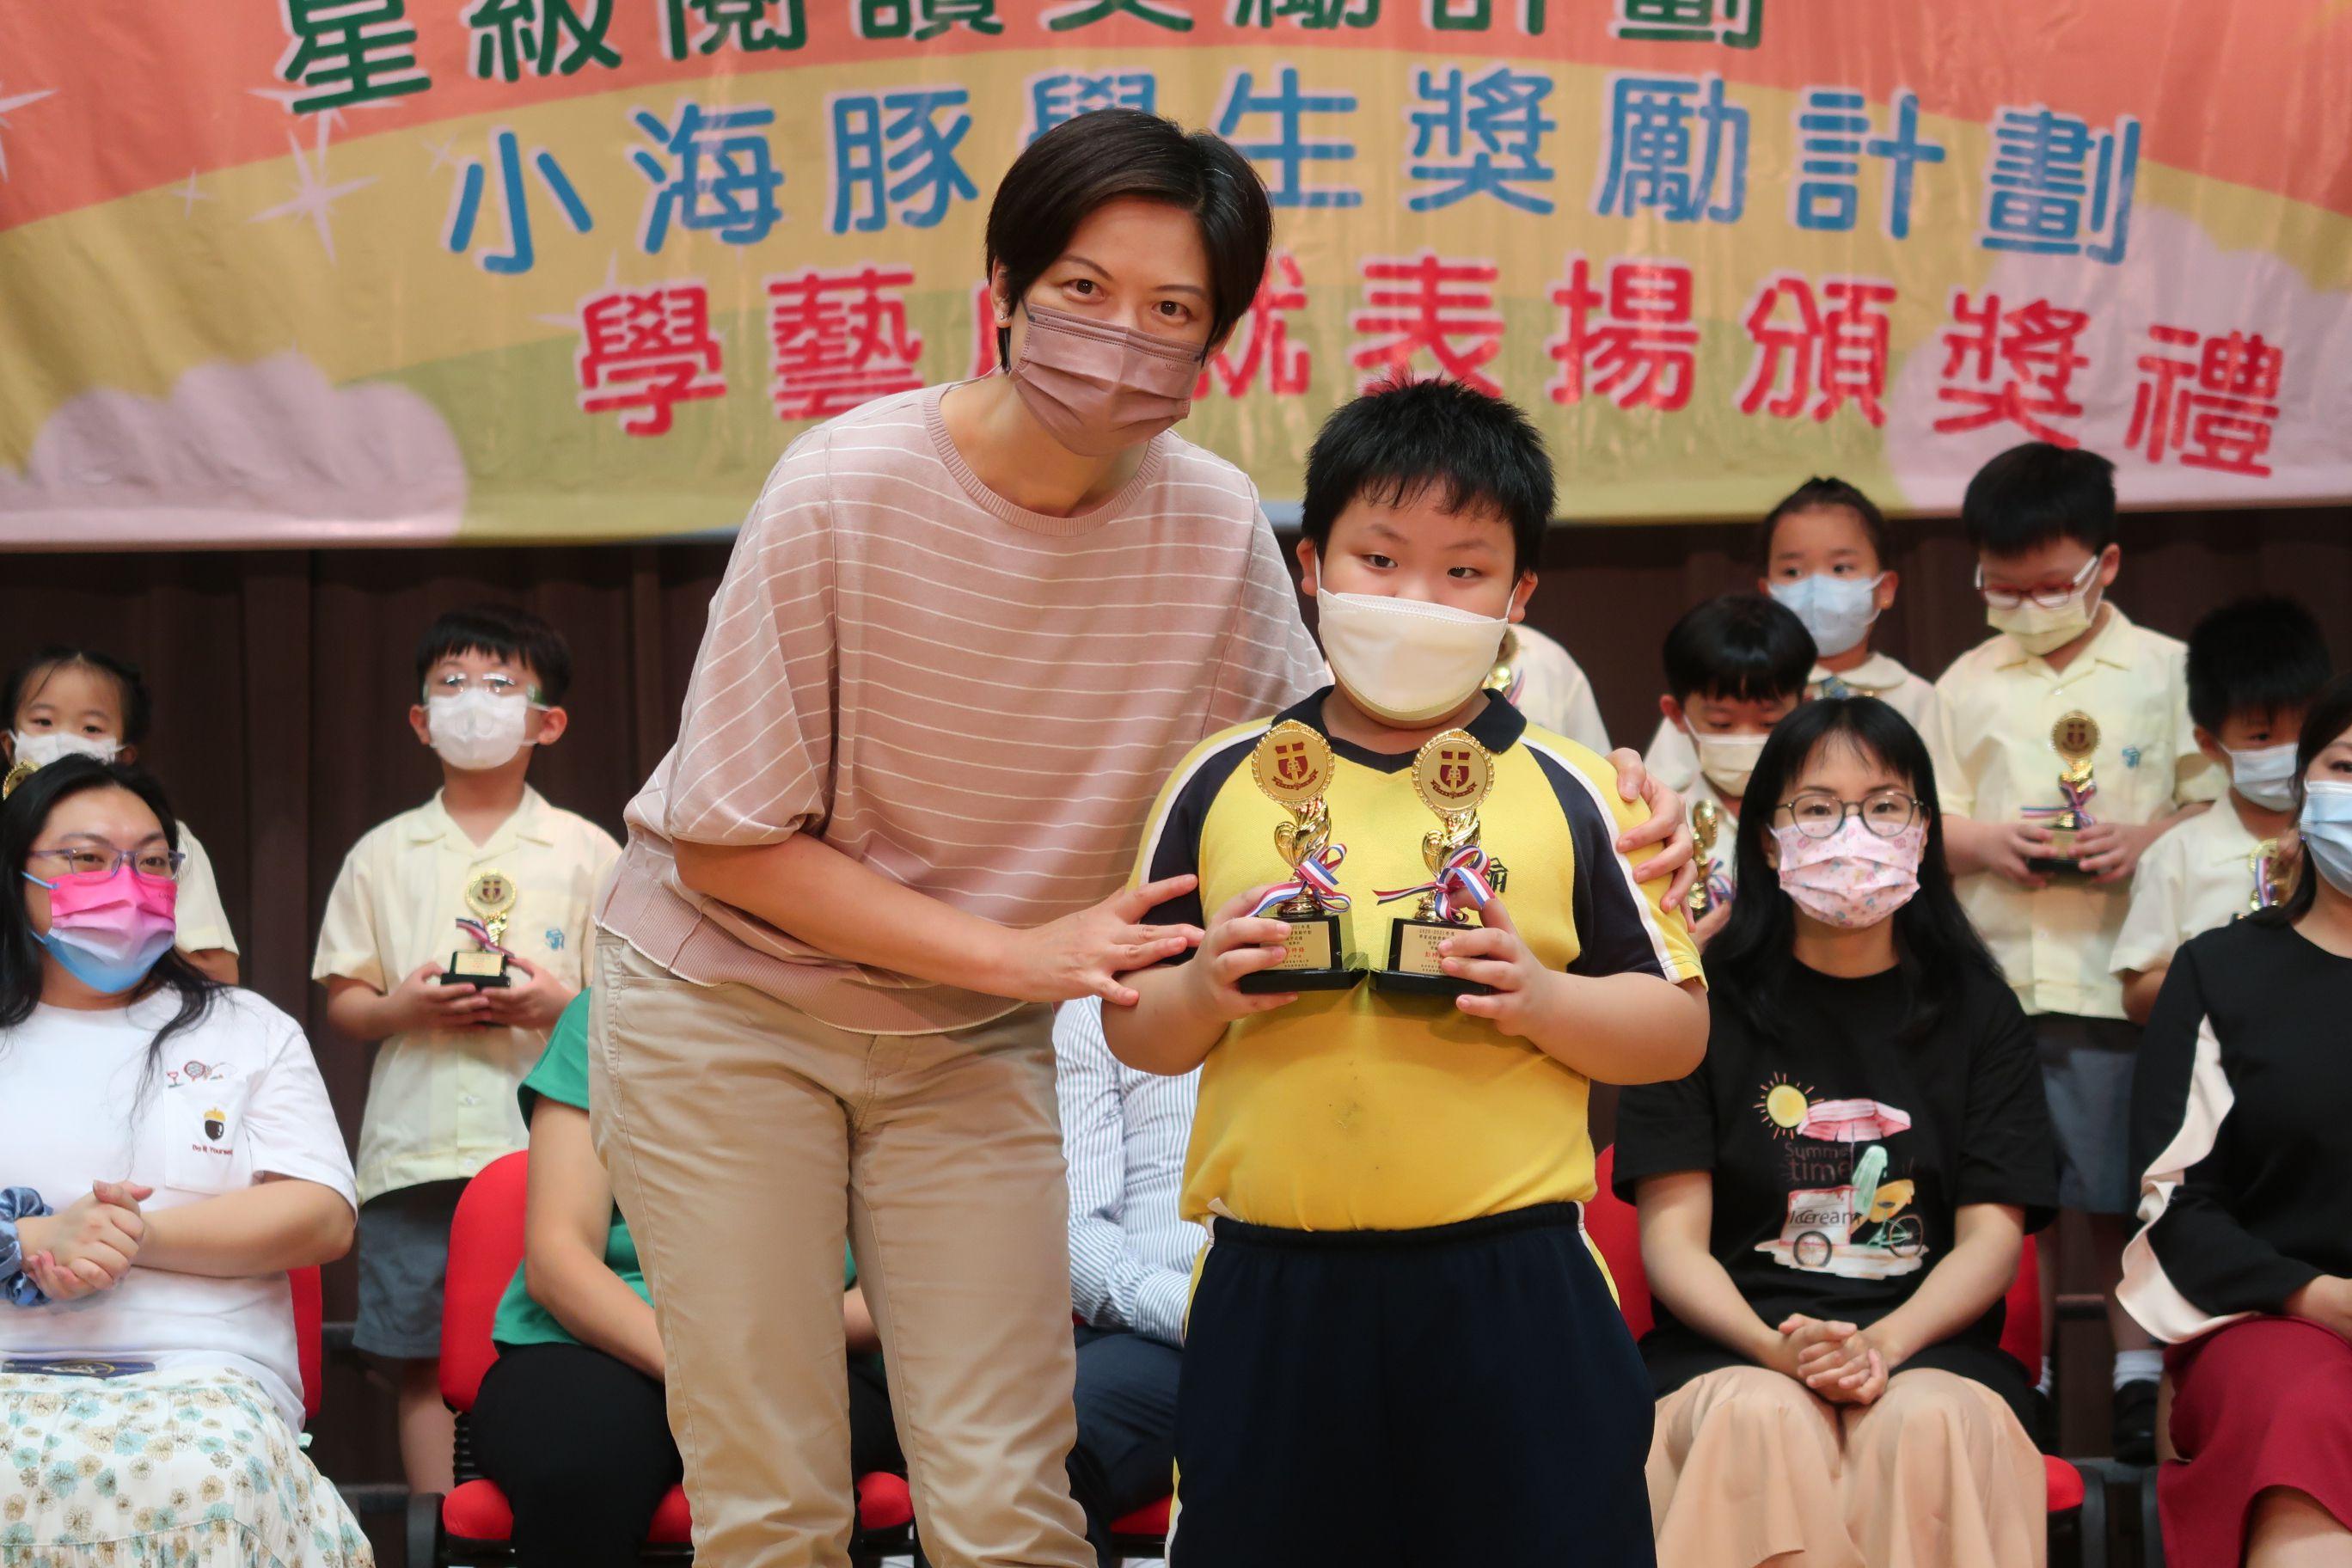 https://syh.edu.hk/sites/default/files/img_5631.jpg